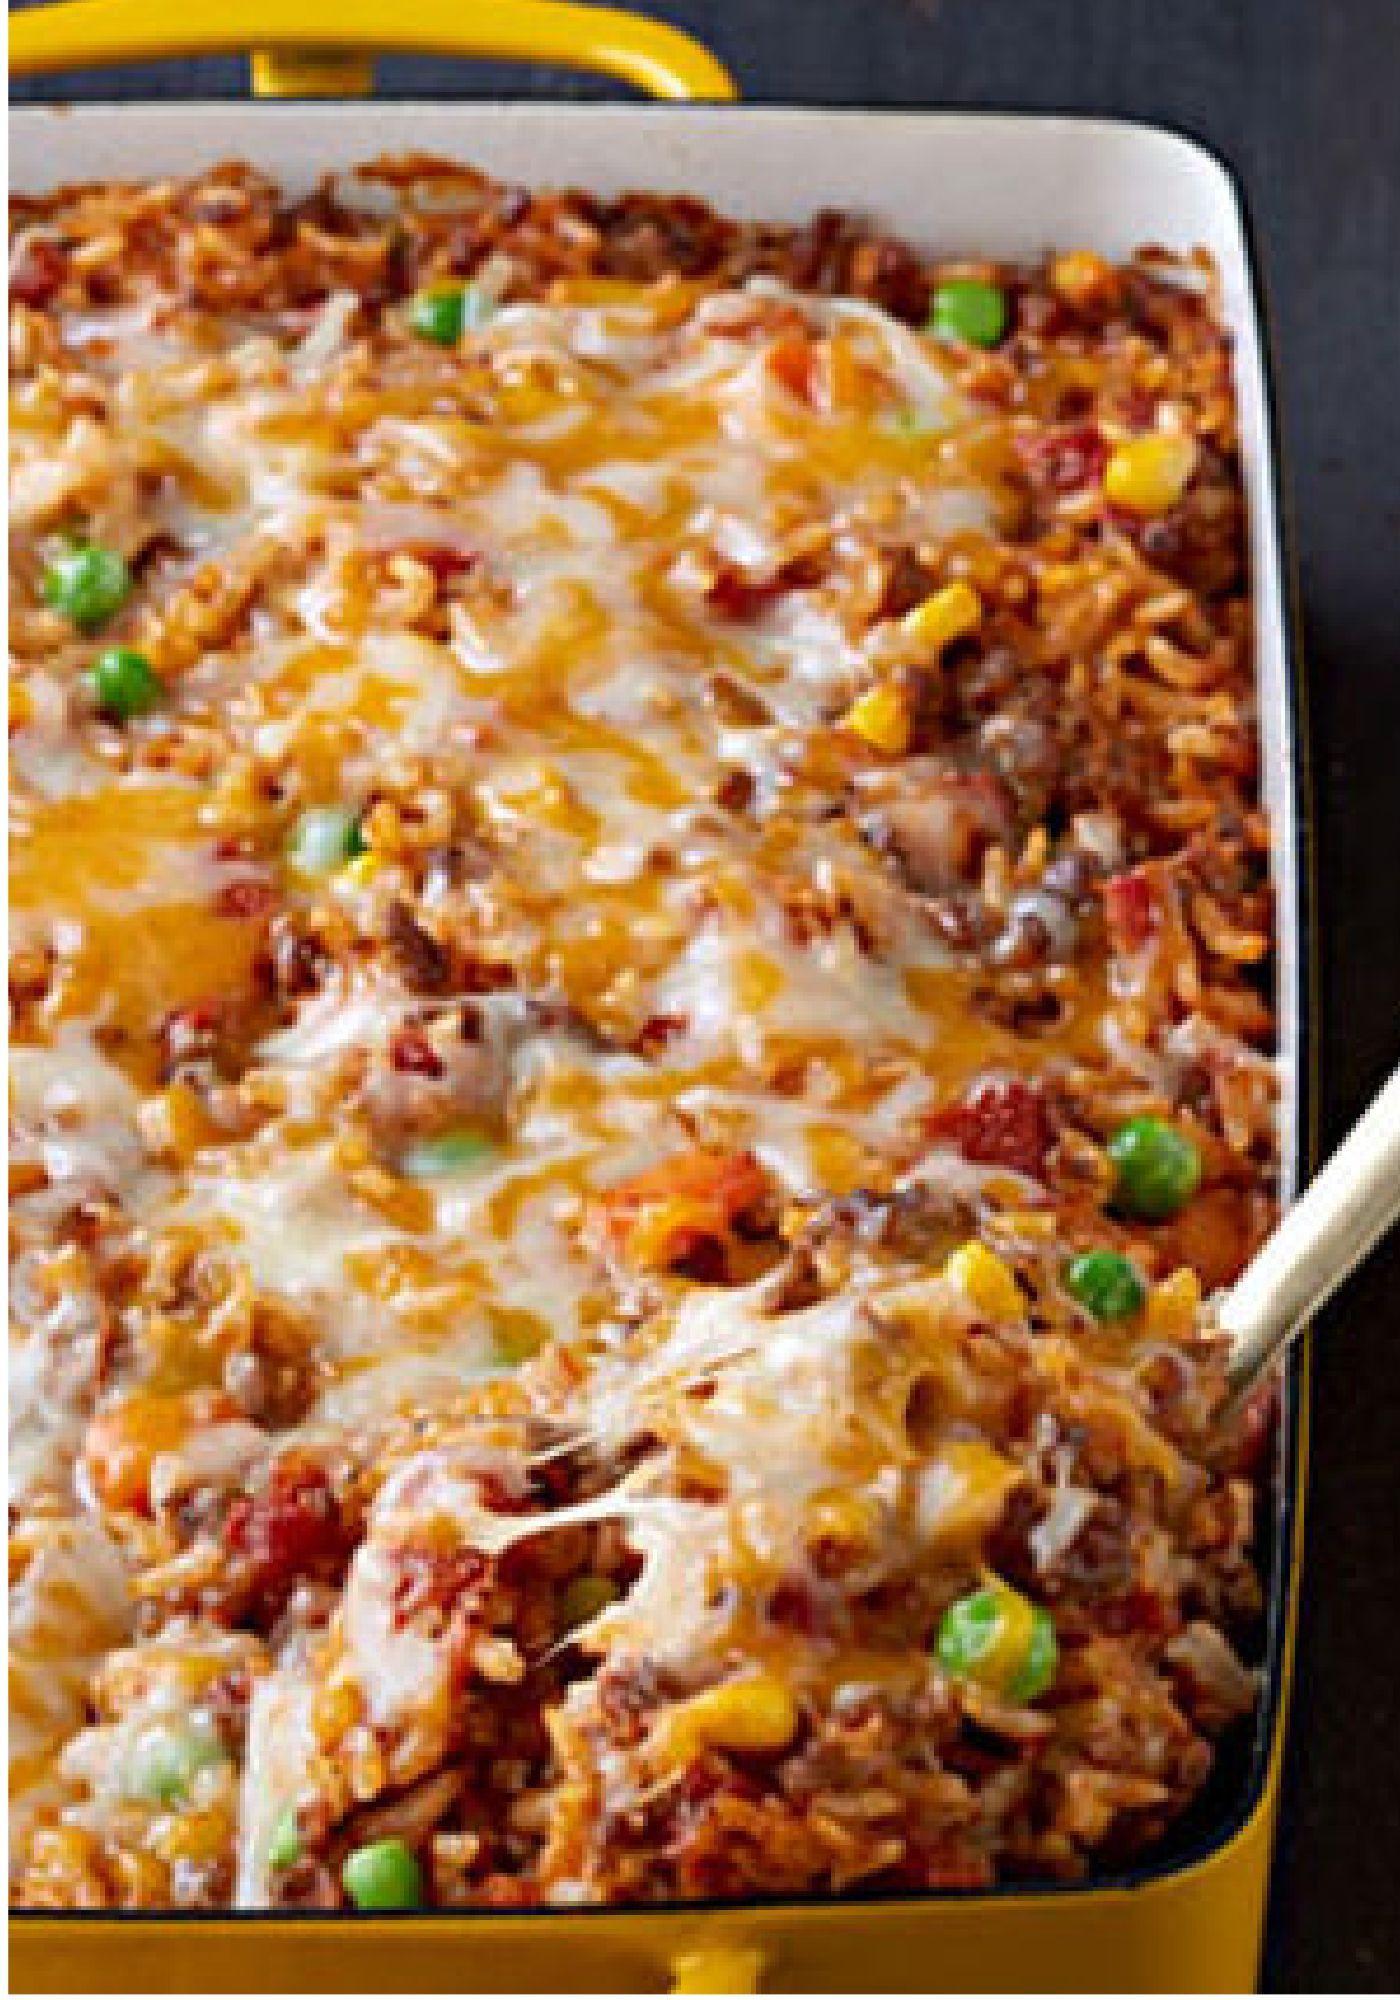 Ground Beef Casserole Recipes  Best 25 Casseroles with ground beef ideas on Pinterest